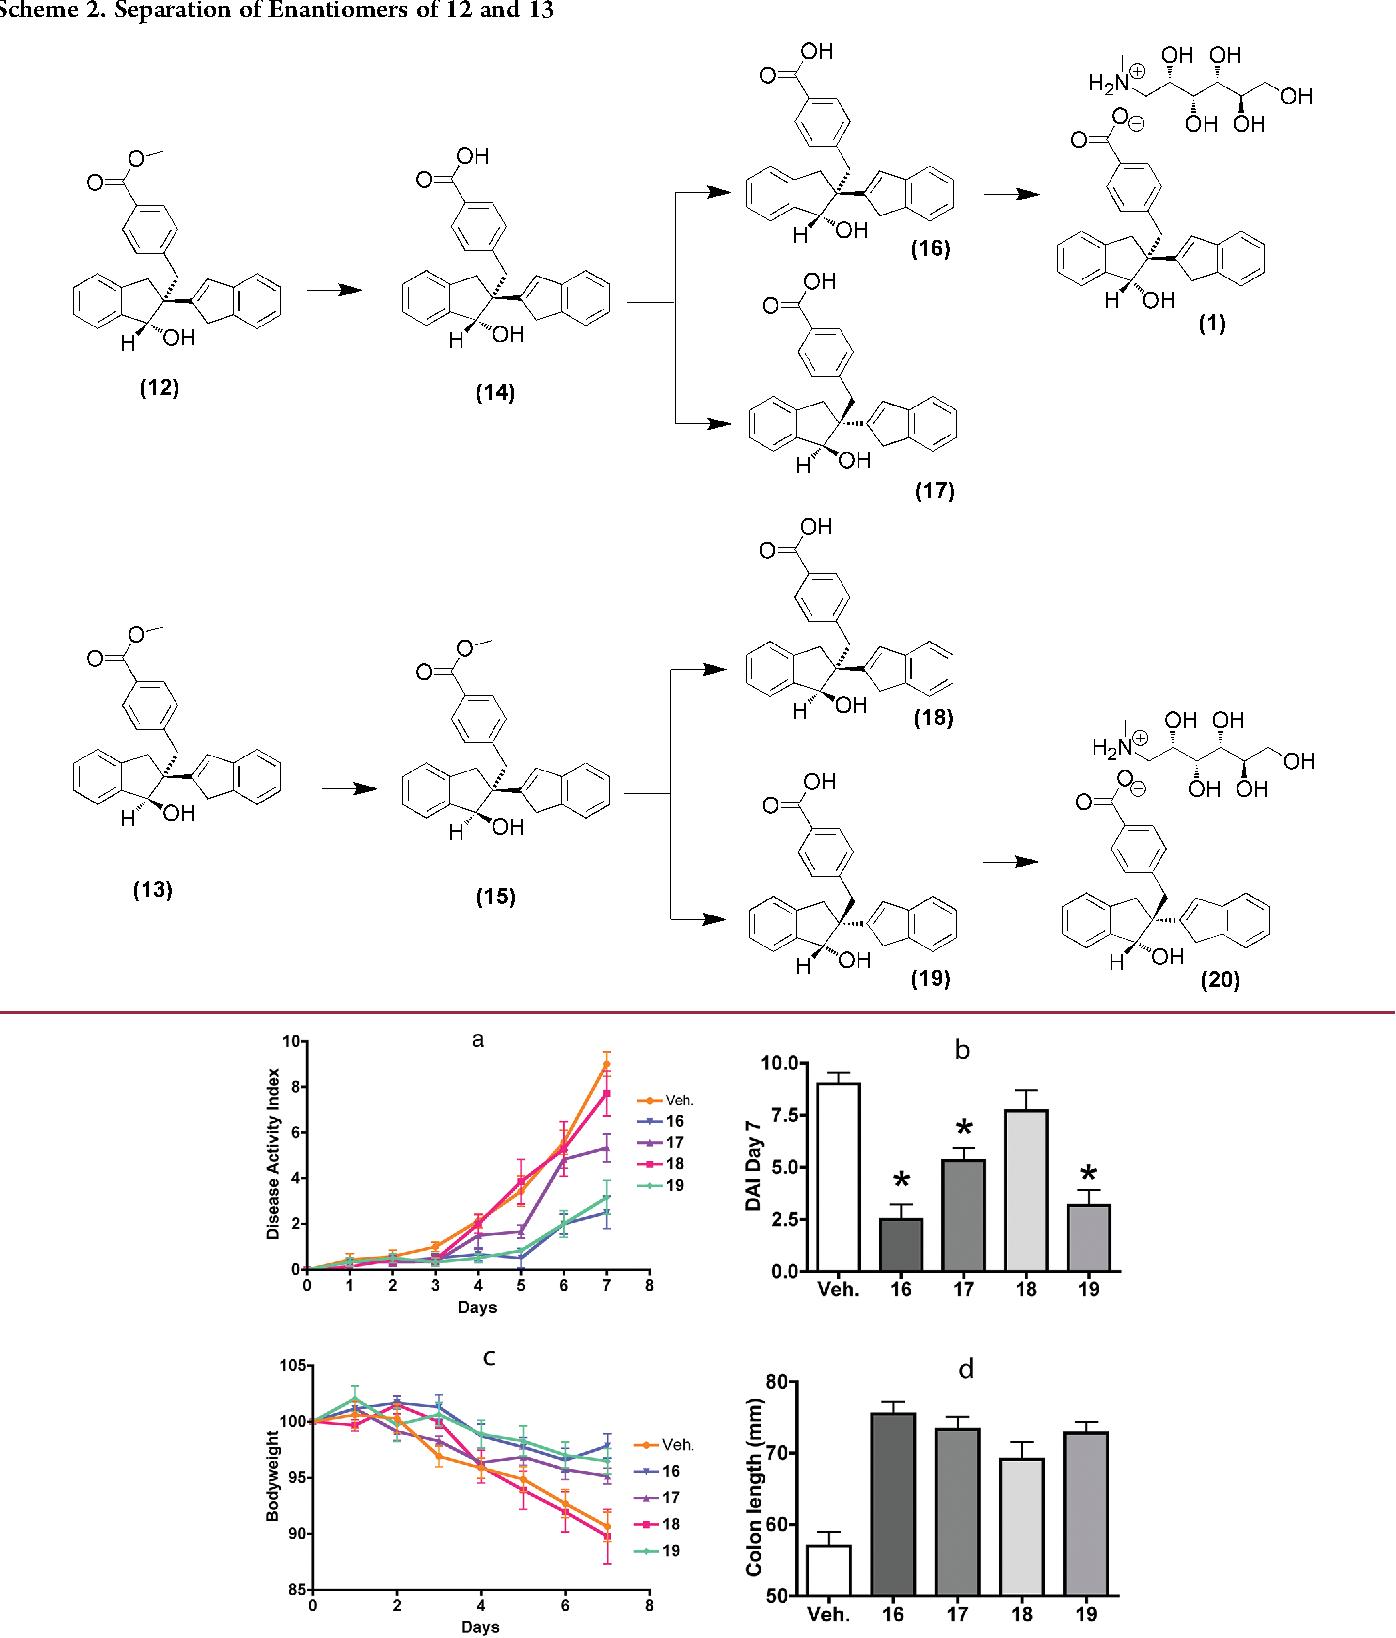 6 Methylaminohexane 12345 Pentanol 4 1S2S 1 Hydroxy 2 3 Dihydro 1H1H 22 Biinden Ylmethylbenzoate PH46A A Novel Small Molecule With